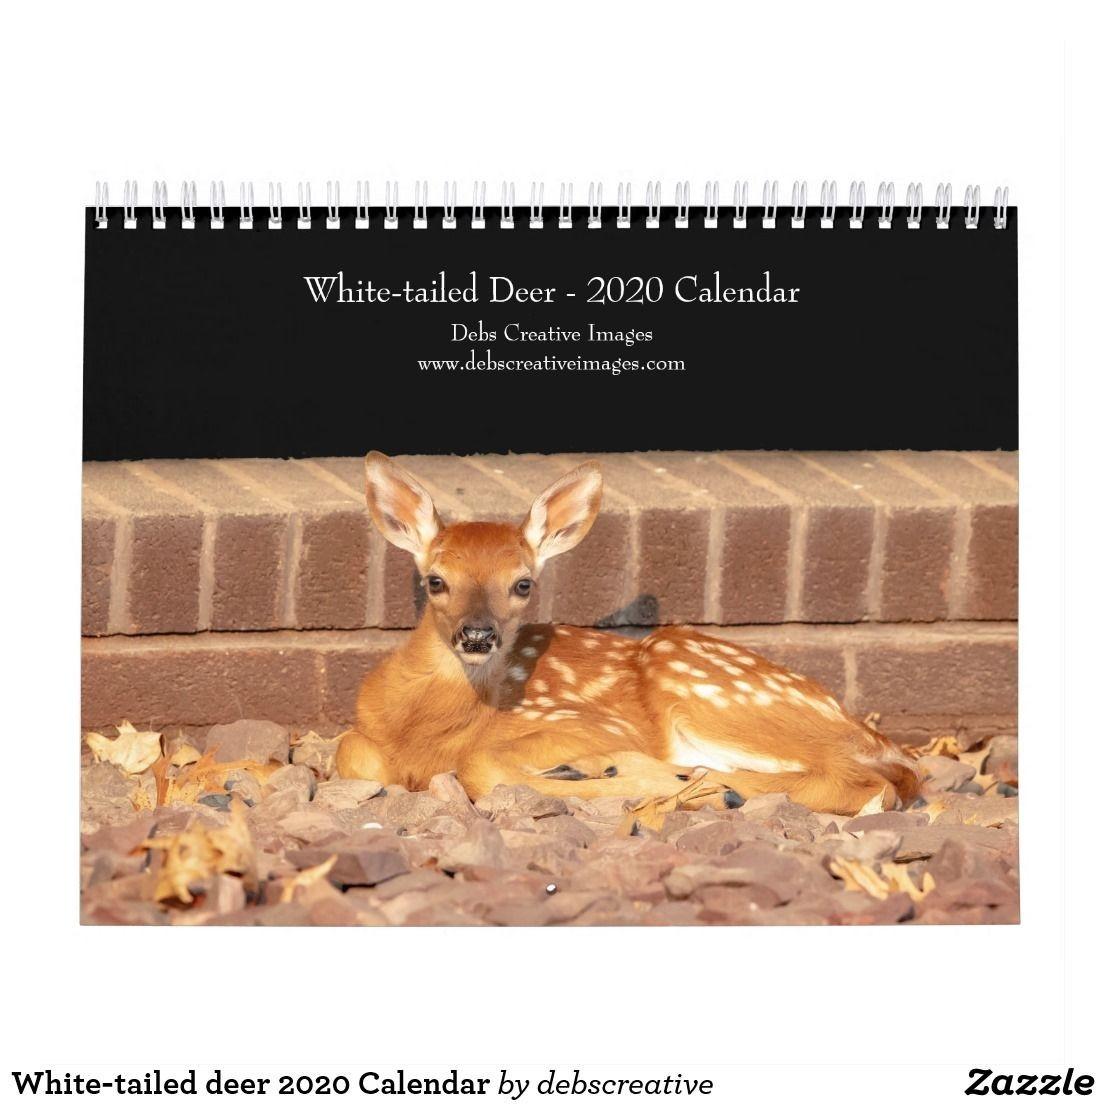 White-Tailed Deer 2020 Calendar | Zazzle | Whitetail Deer, 2021 Calendar, Deer-Indiana 2021 Deer Calender